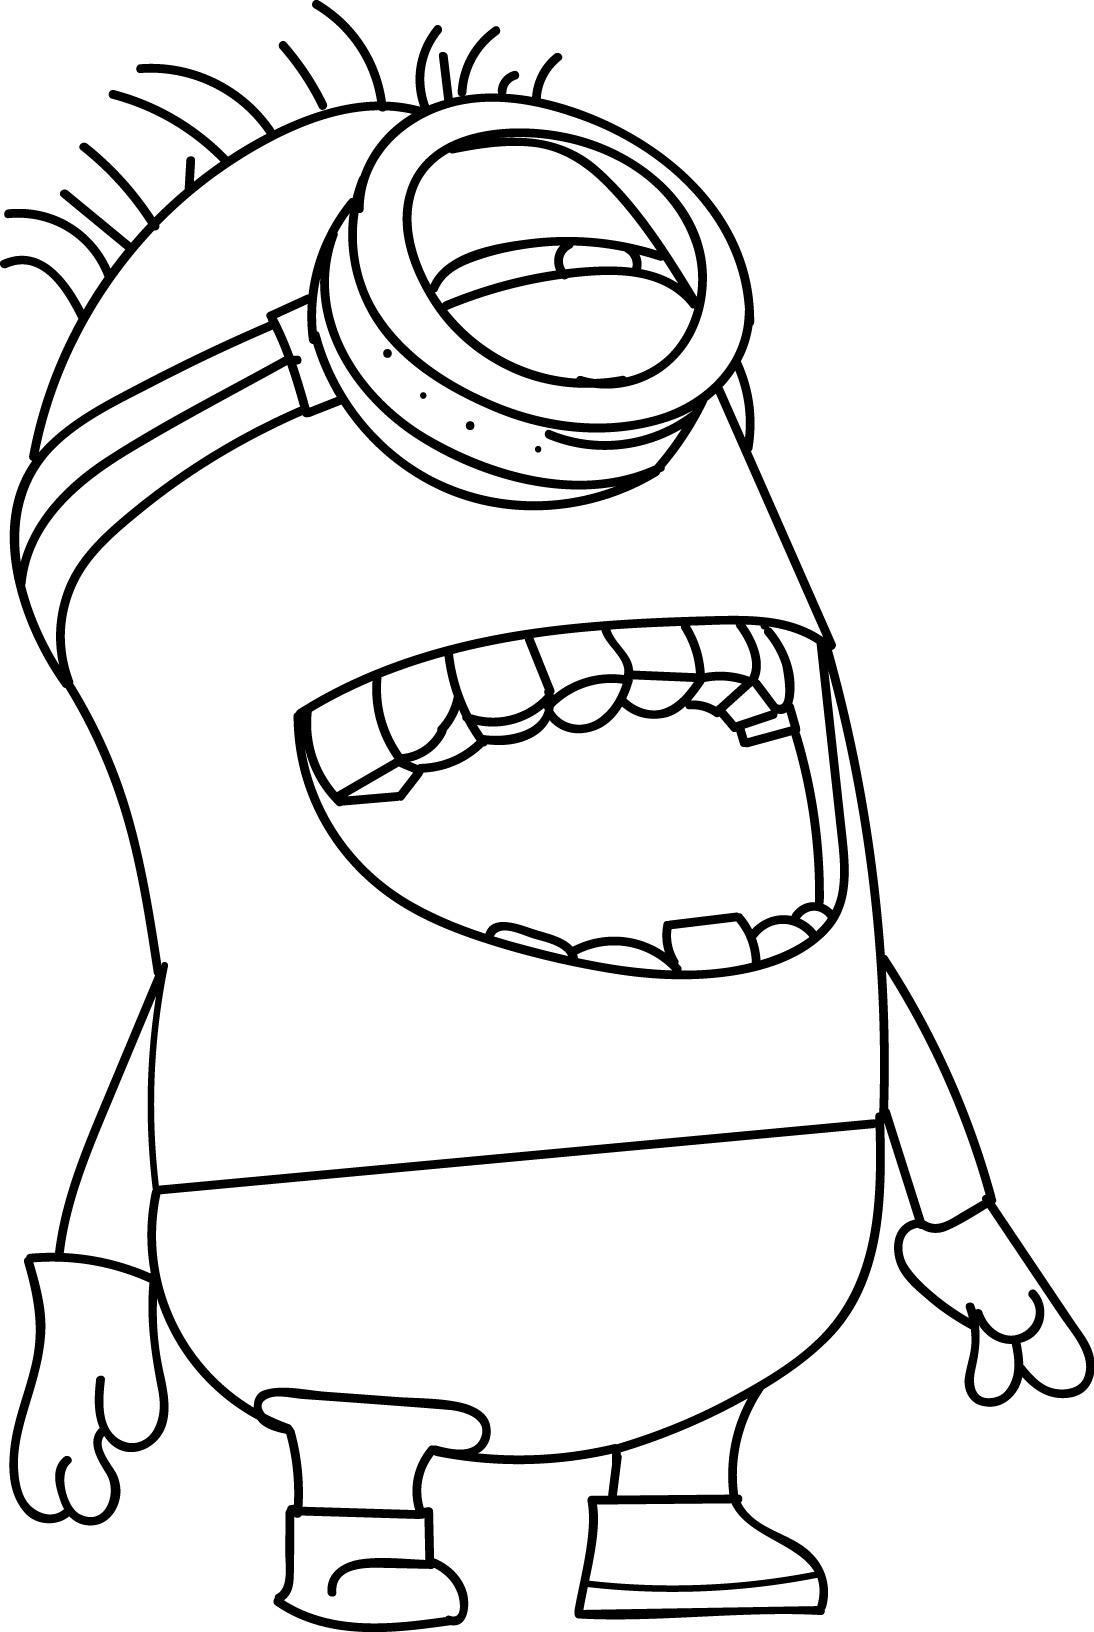 Minion Laugh Coloring Page Wecoloringpage Three Minions Coloring Template